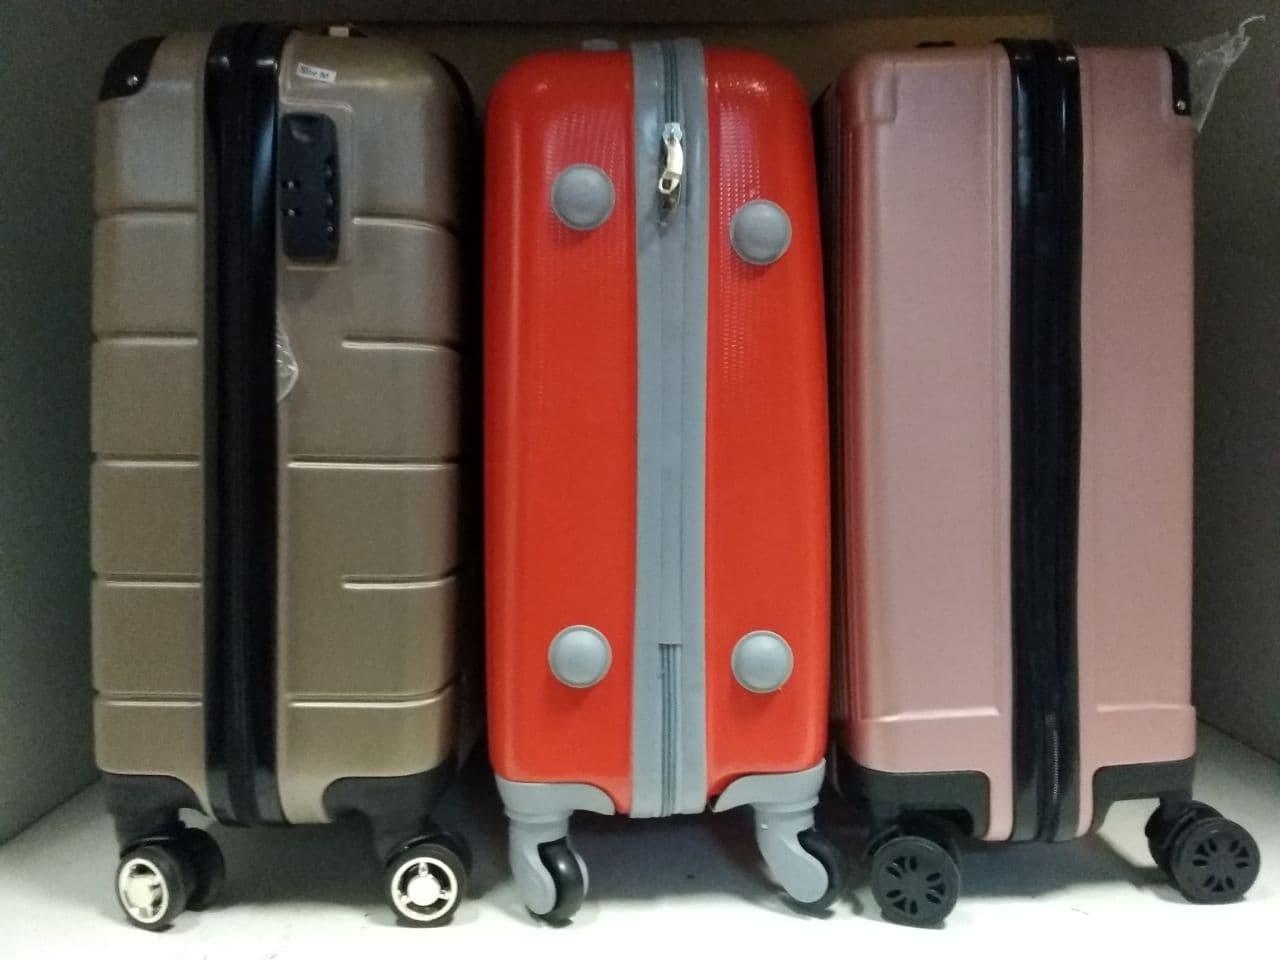 Твердые чемоданы из пластика поликарбонат АБС-пластик Топтревел Луида Аолард